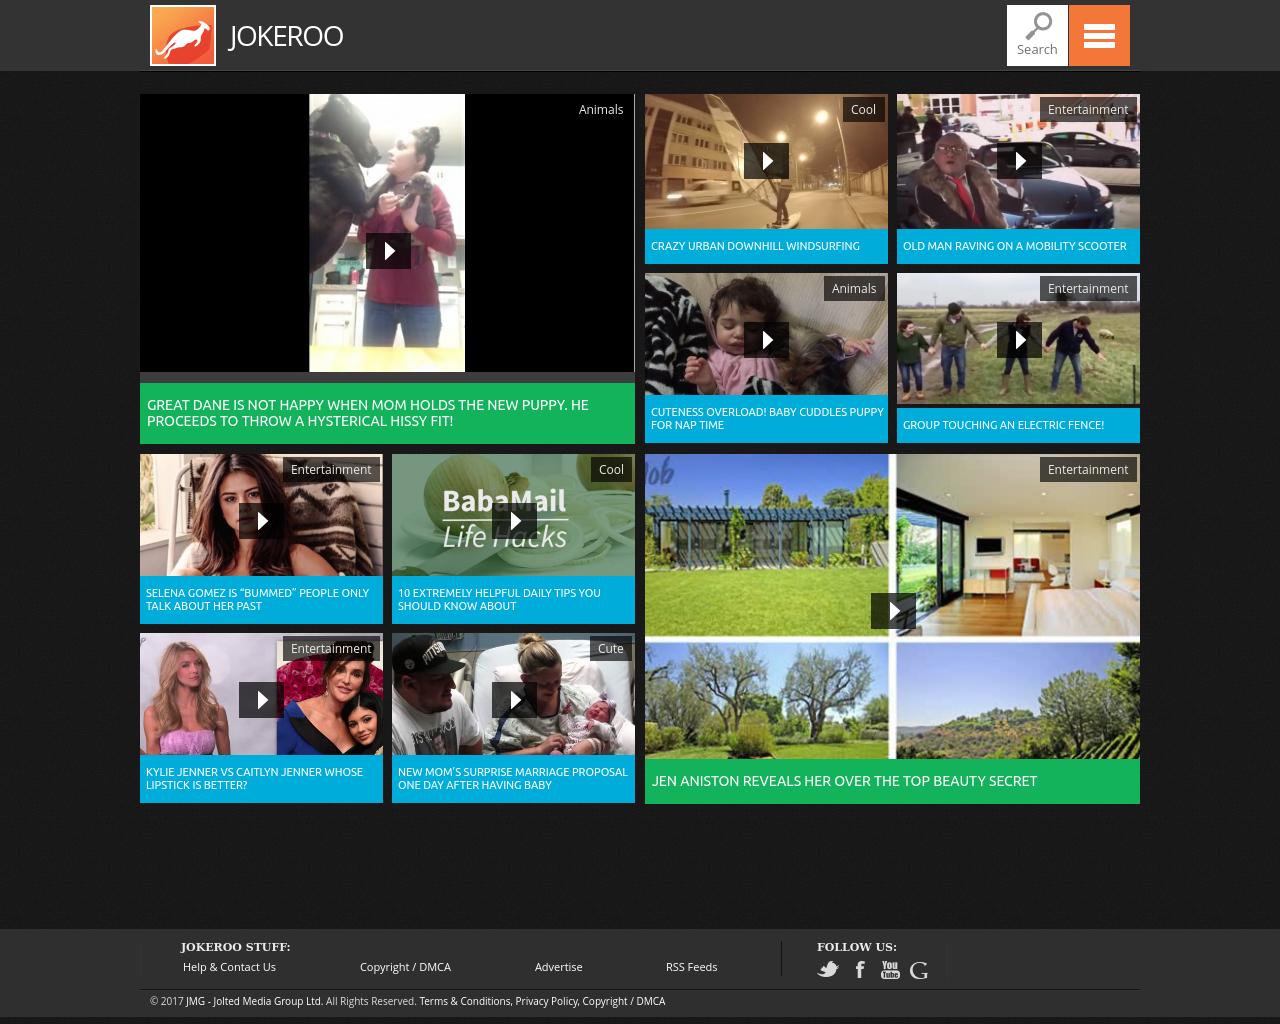 JOKEROO-Advertising-Reviews-Pricing